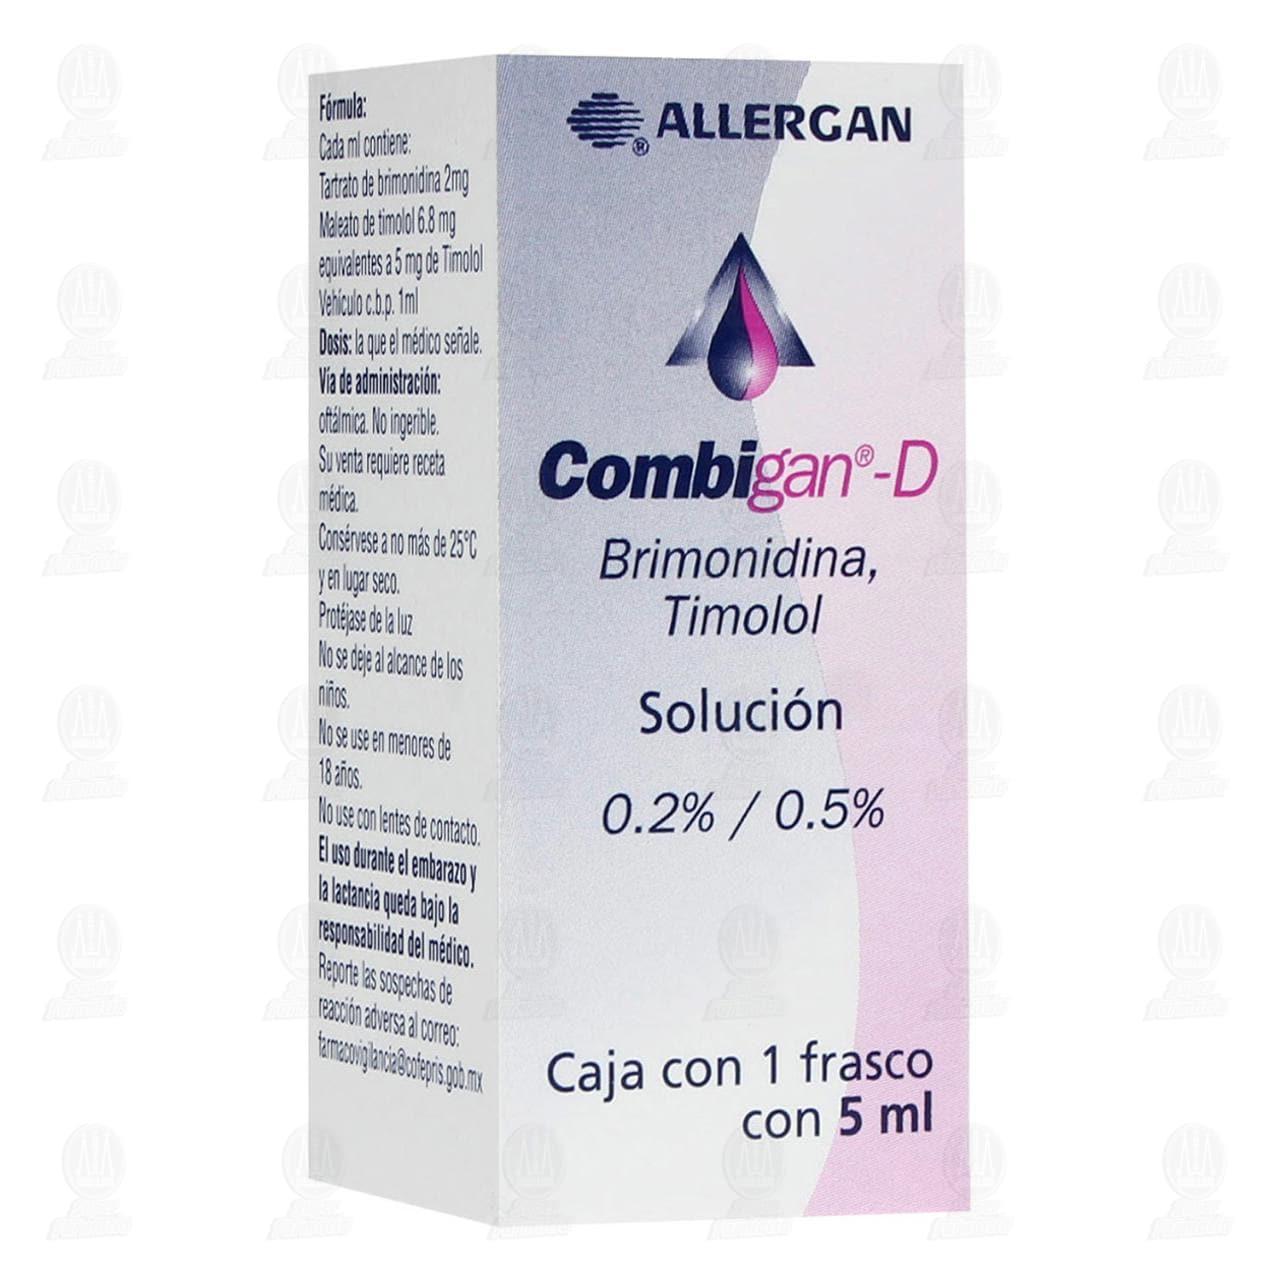 Comprar Combigan D 0.2/0.5% 5ml Solución Oftálmica en Farmacias Guadalajara